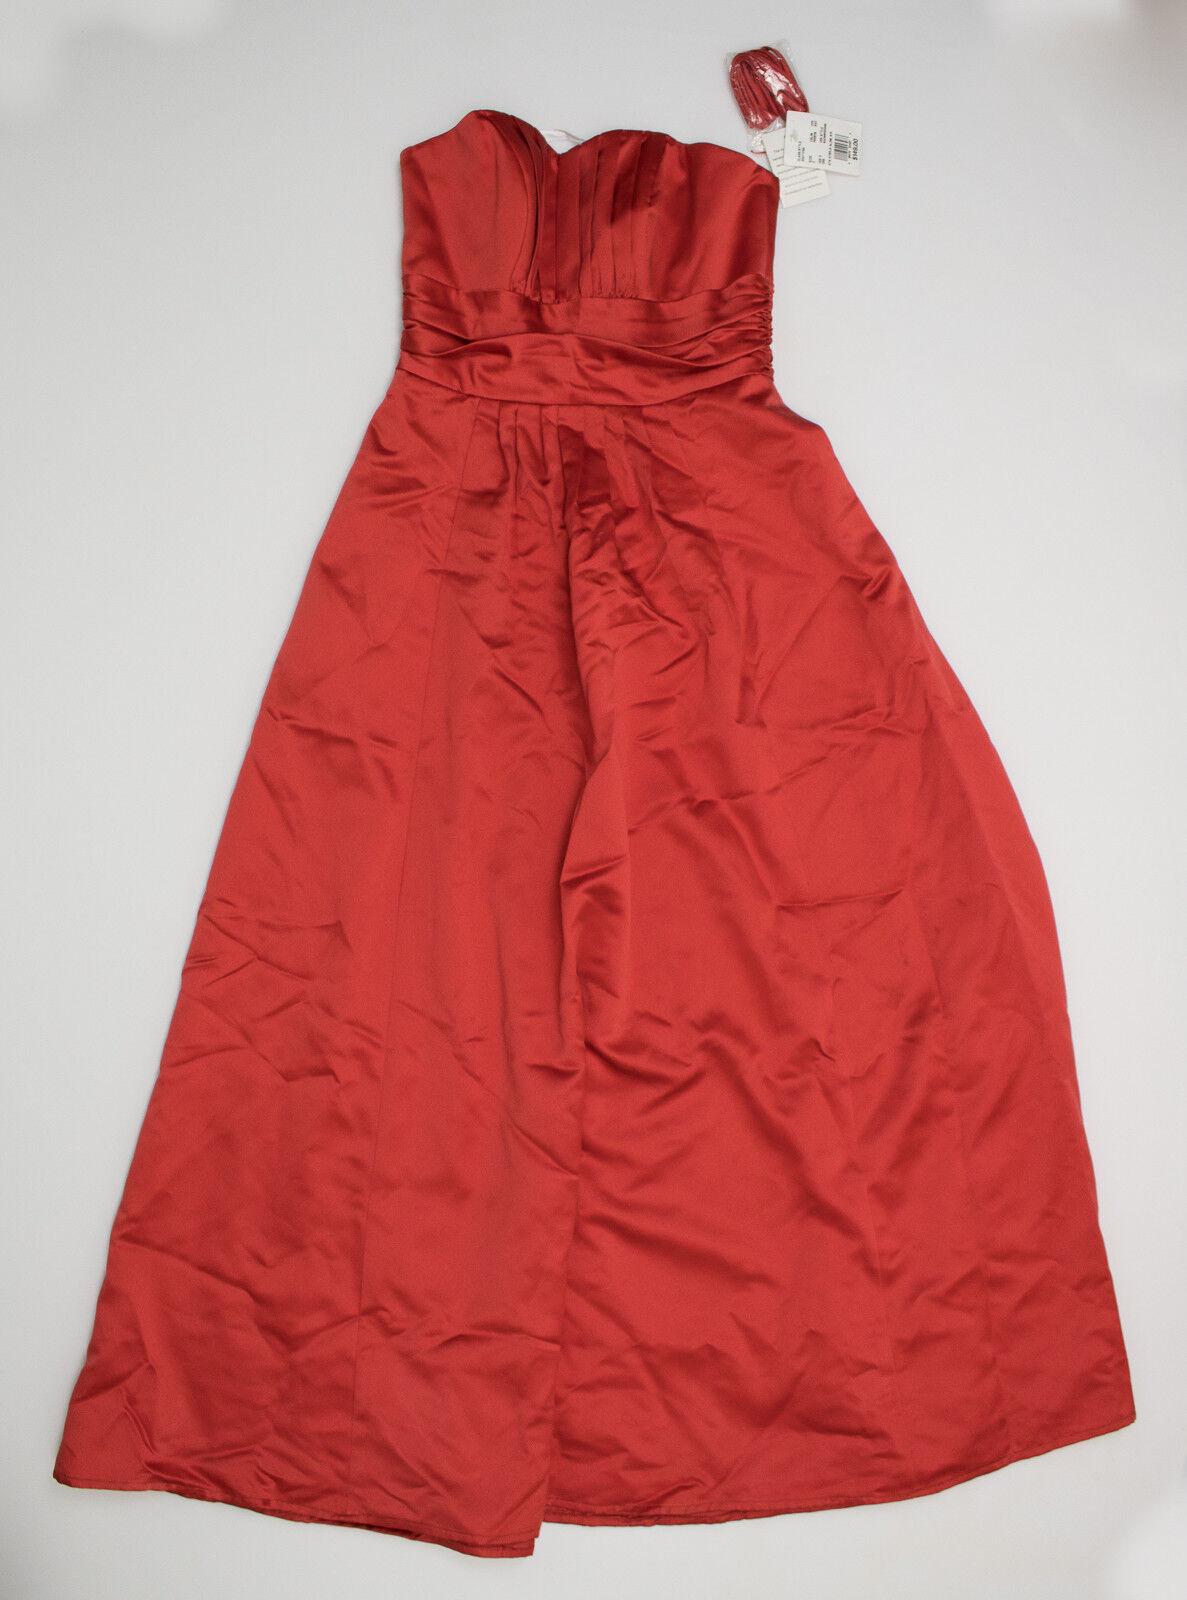 David's Bridal Womens Empire Waist Prom Dress Red Sleeveless Size 2